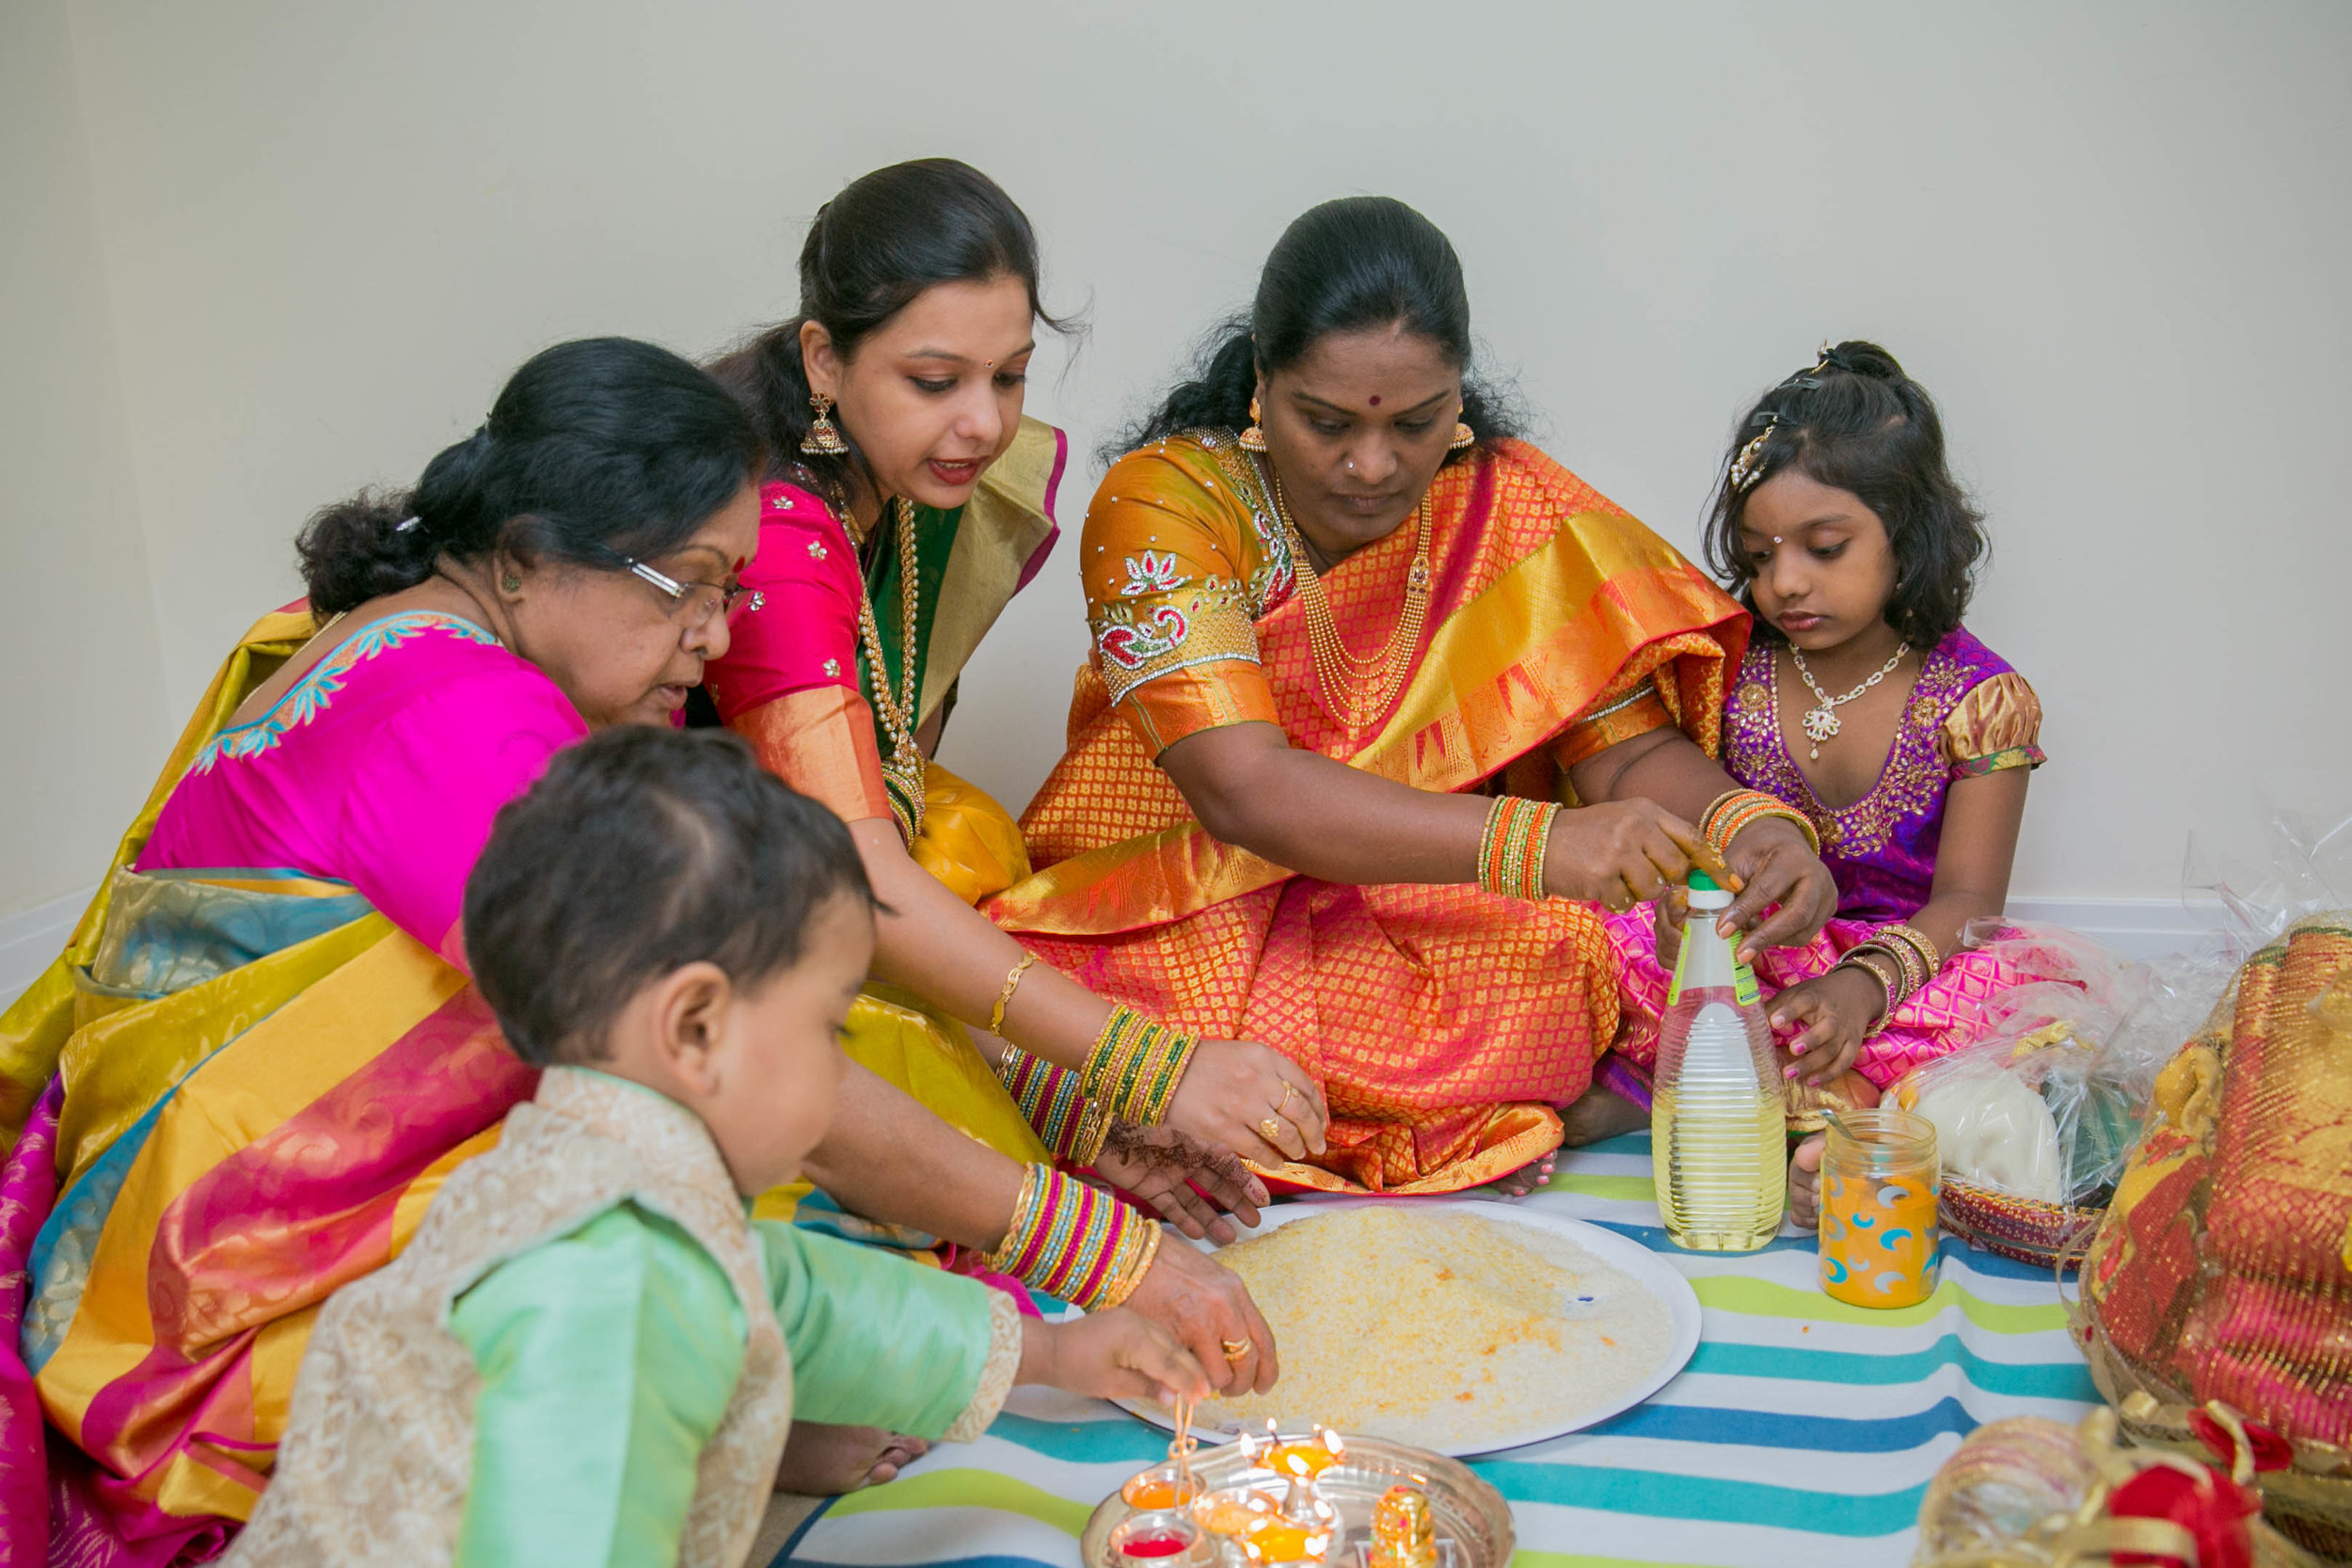 premier-banquetting-london-Hindu-asian-wedding-photographer-natalia-smith-photography-1.jpg